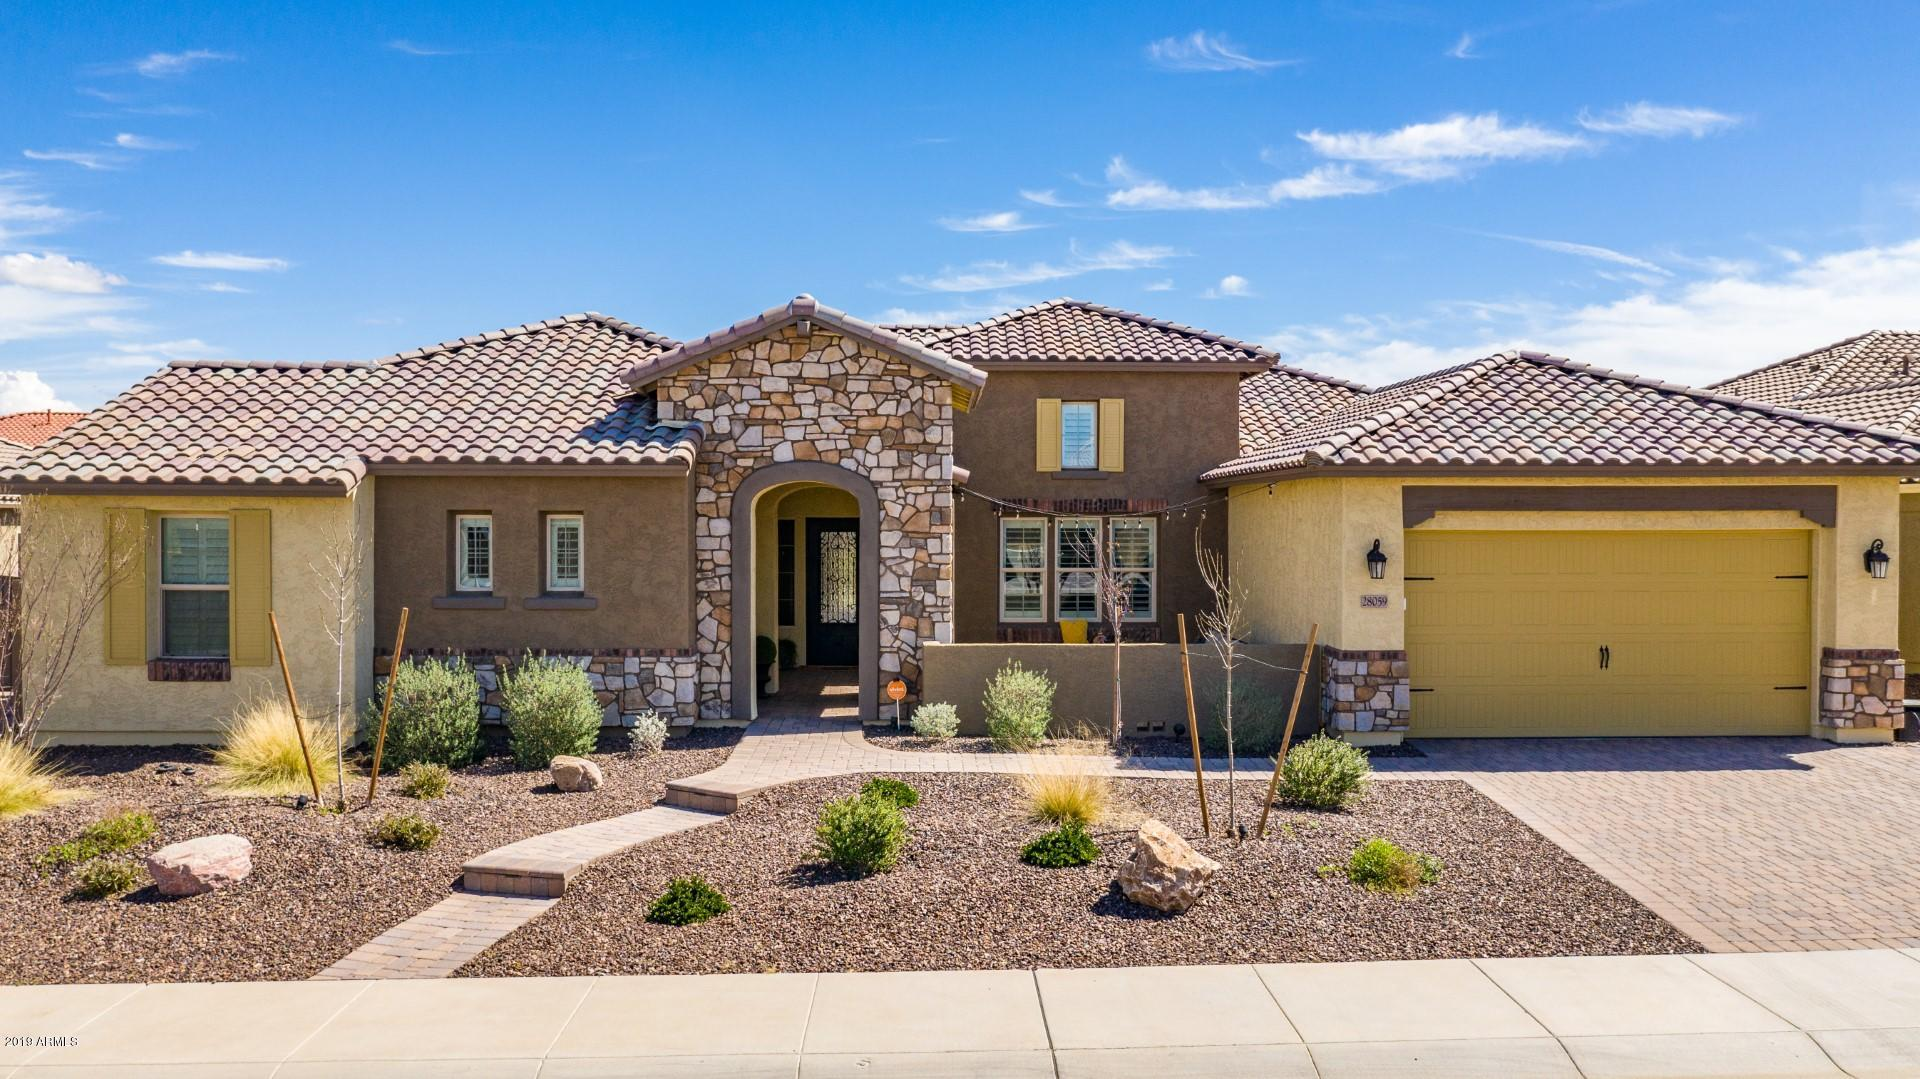 28059 N 99TH Lane, Peoria, Arizona